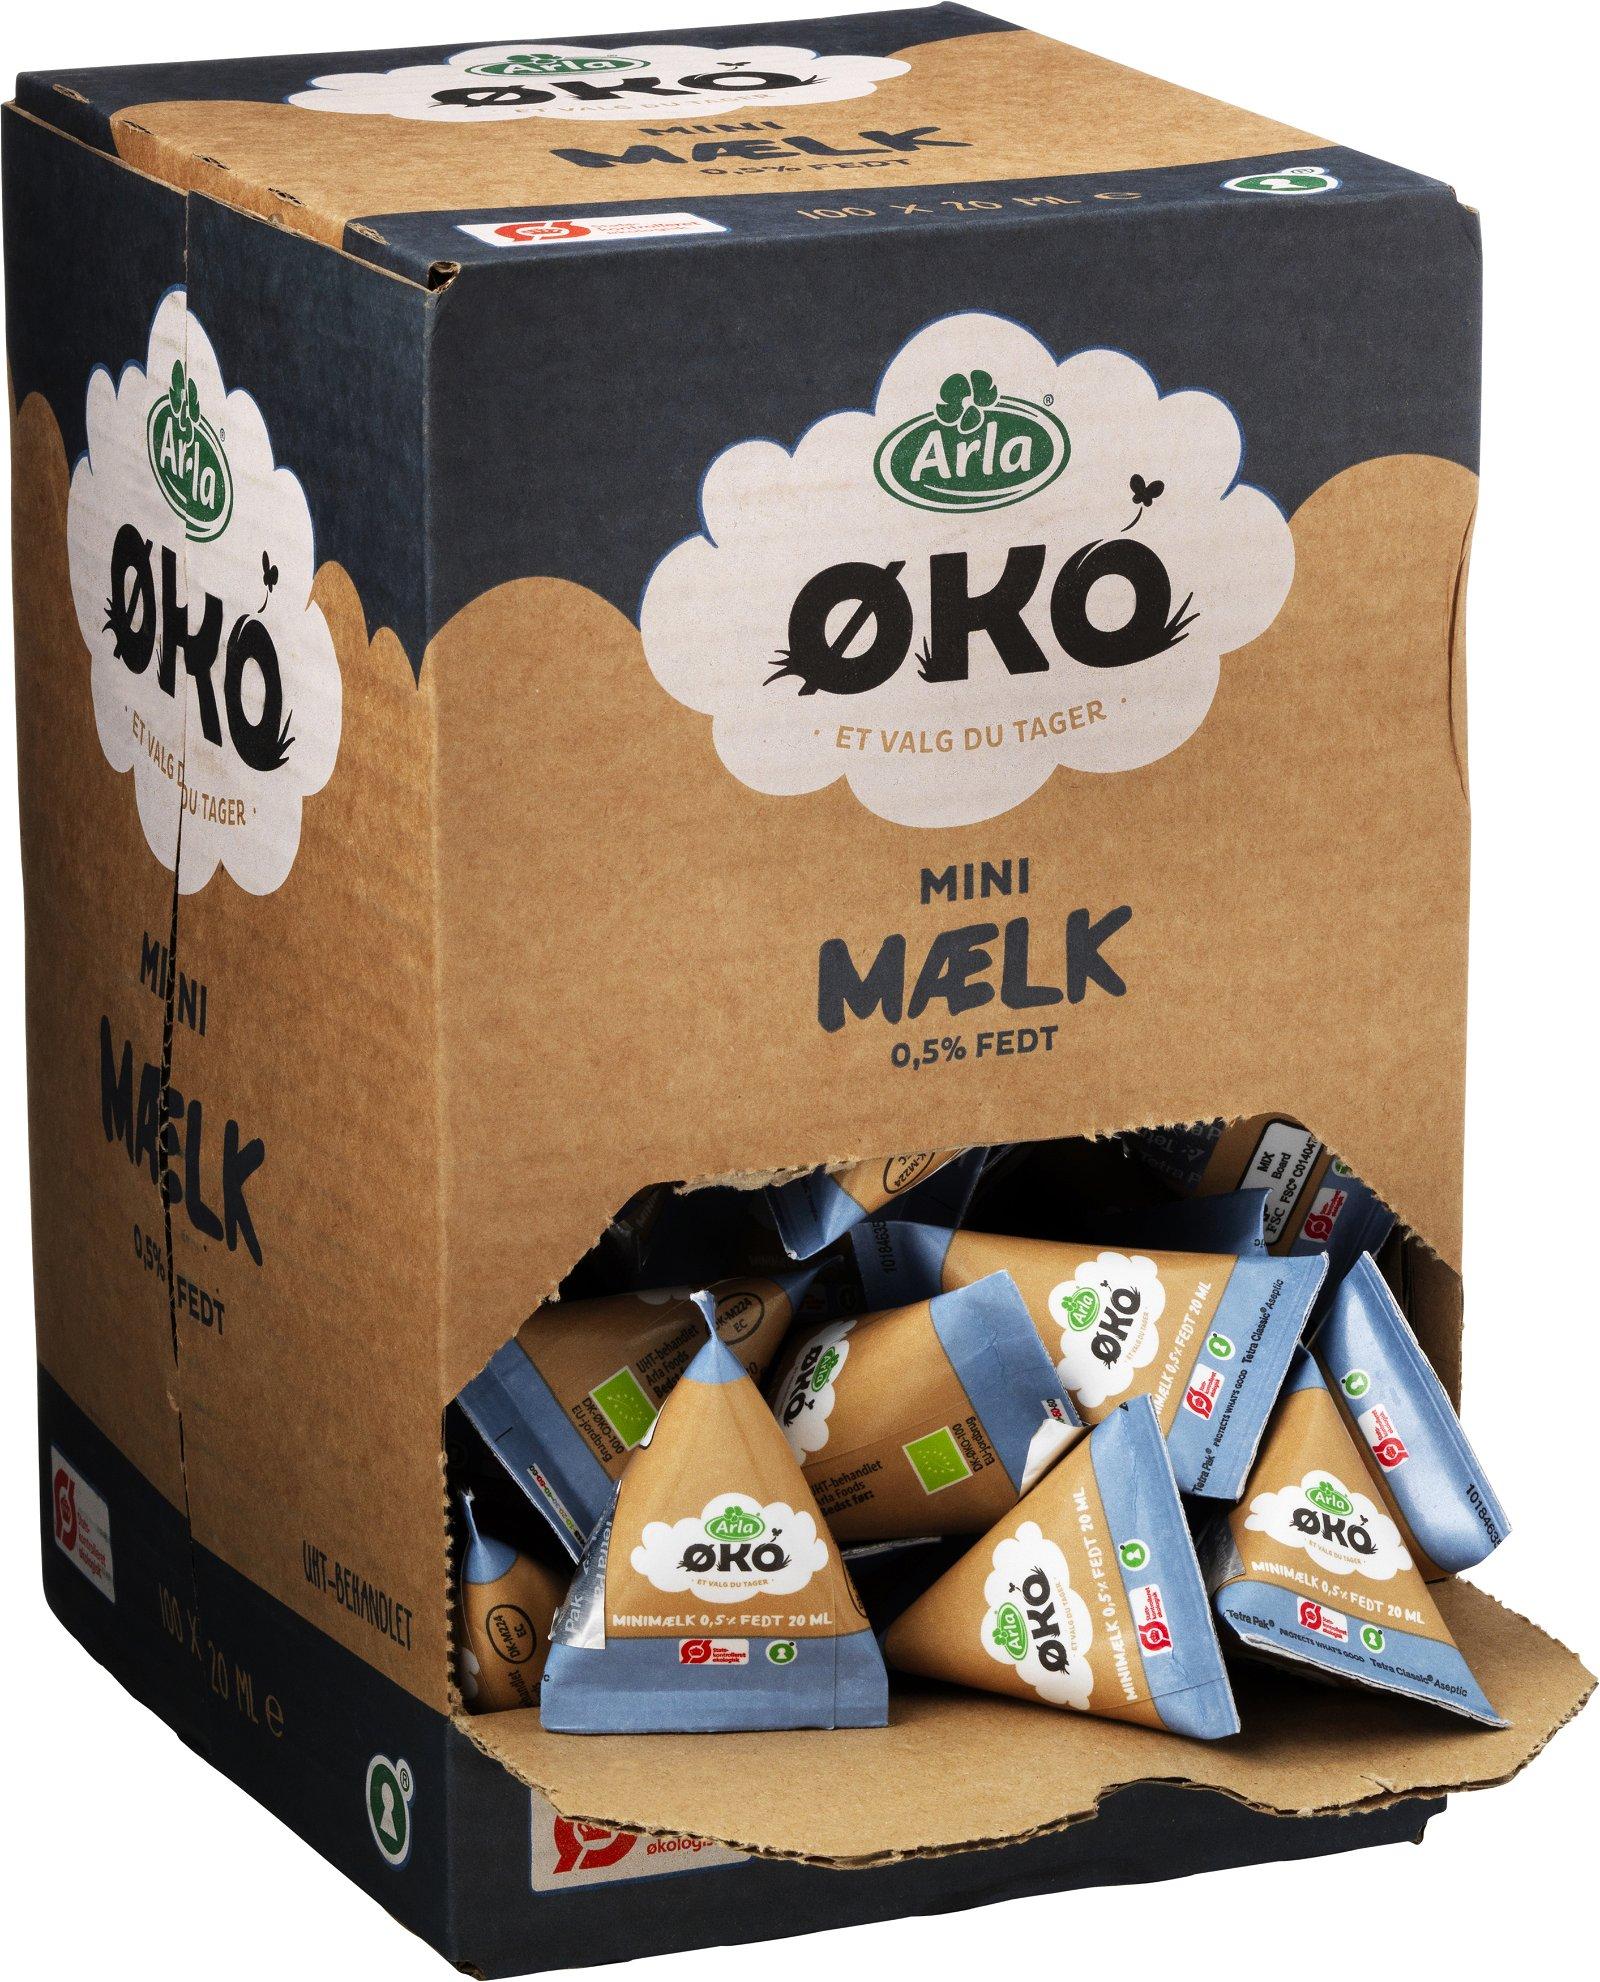 Arla økologisk minimælk